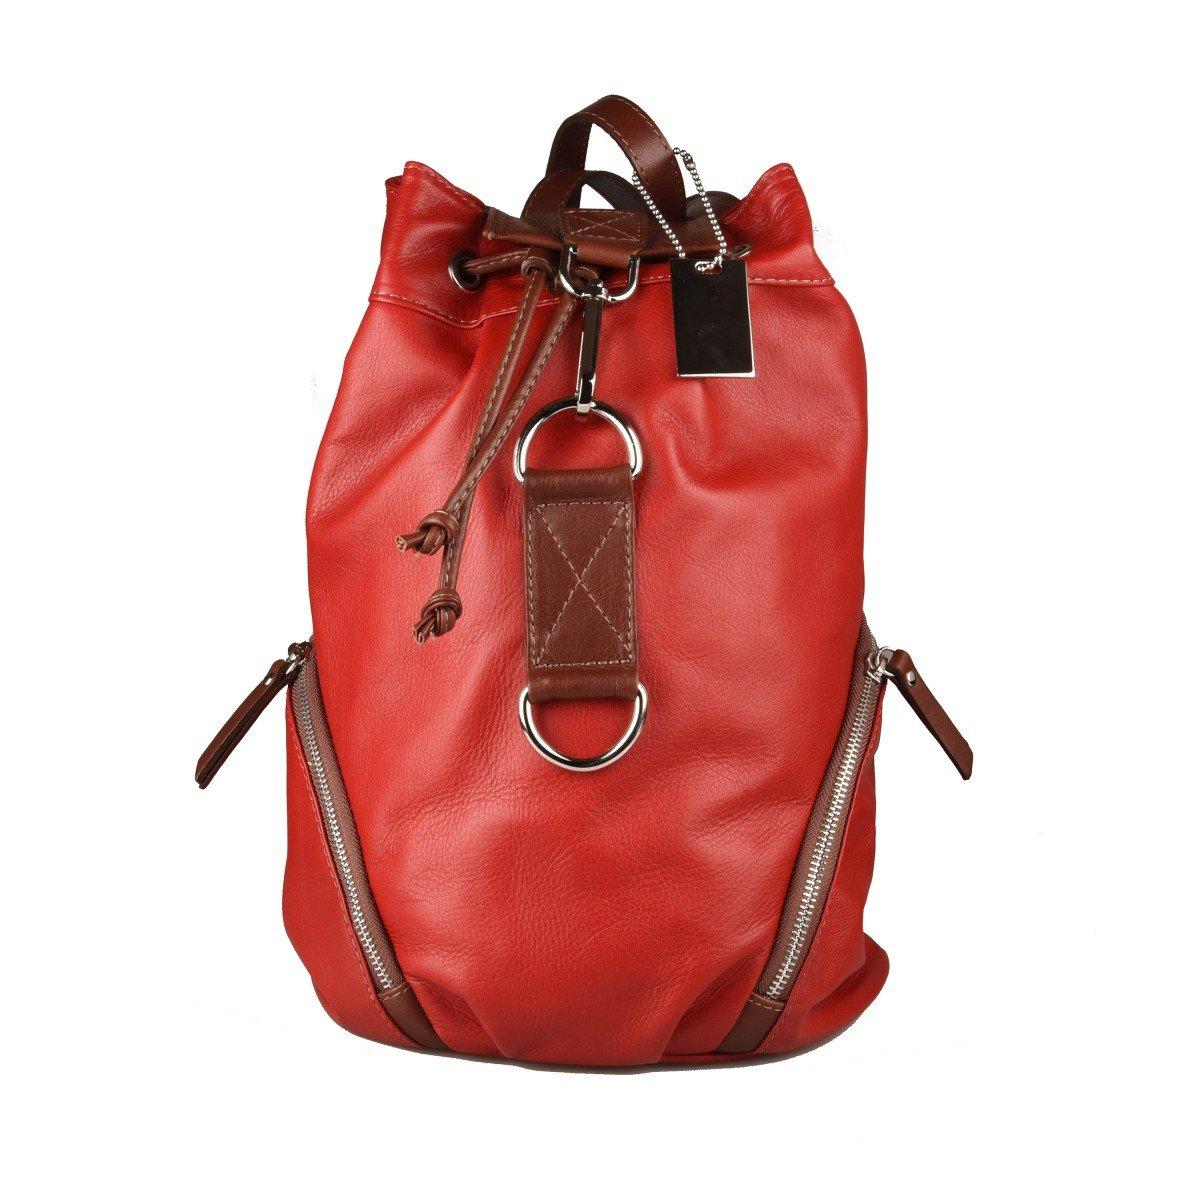 Dream Leather Bags Made in Italy Genuine Leather レディース 565-4 US サイズ: 1 M US カラー: レッド   B07CV553W9